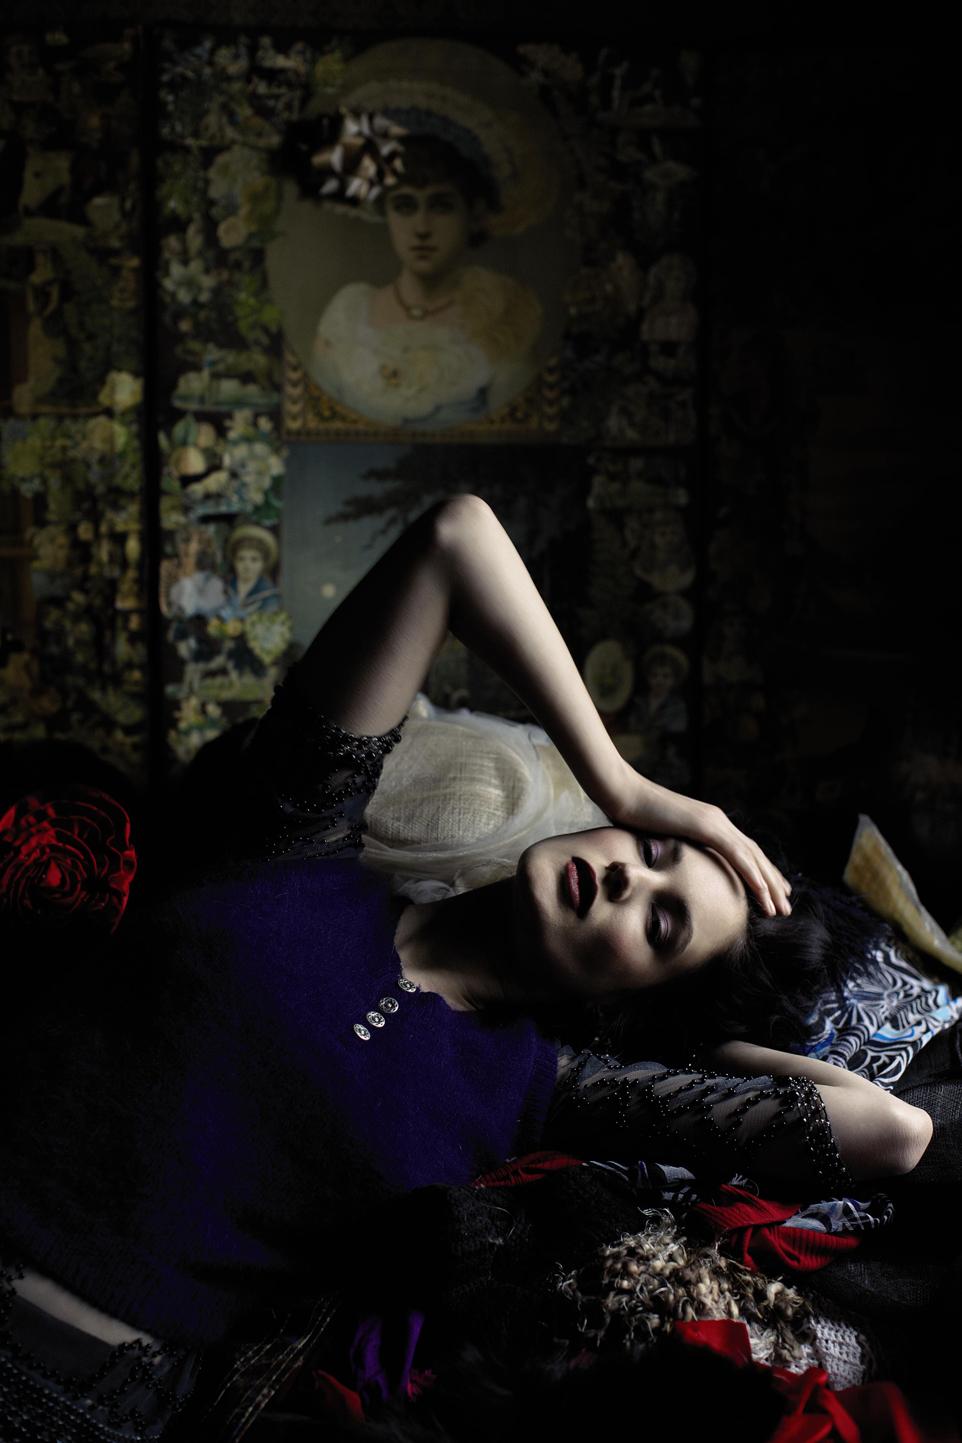 Jayne by Martin Storey